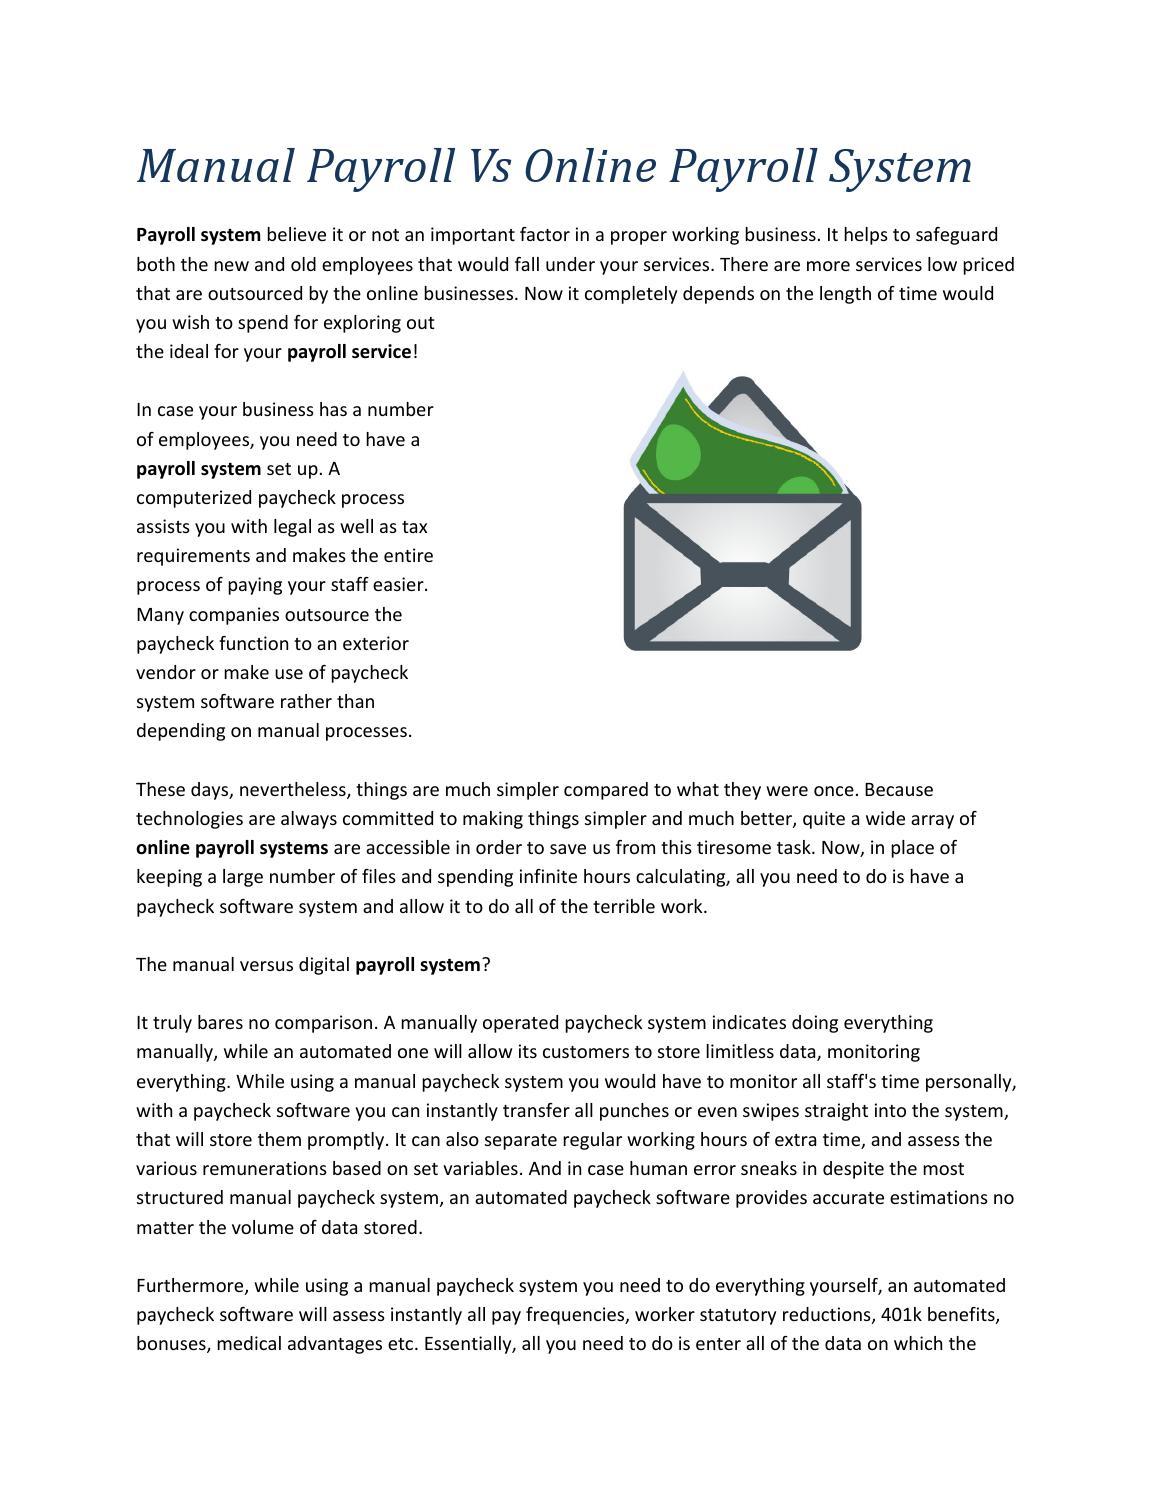 Internet Payroll System